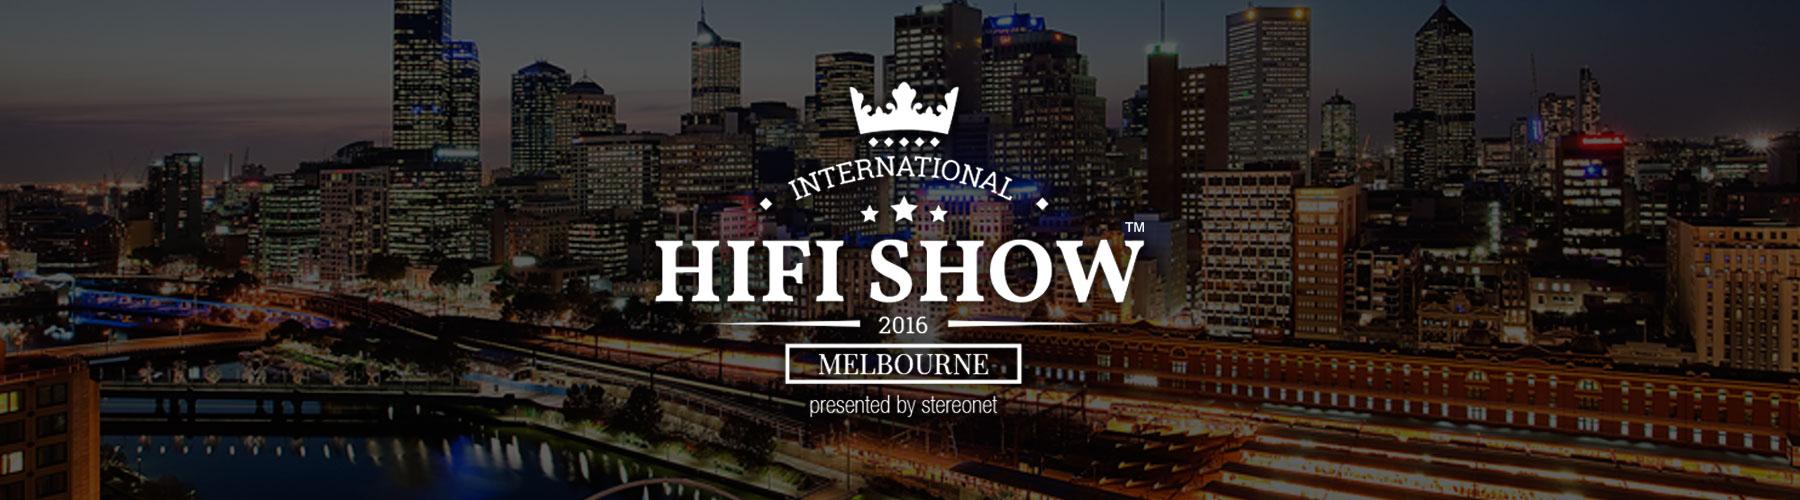 international-hifi-show-melbourne